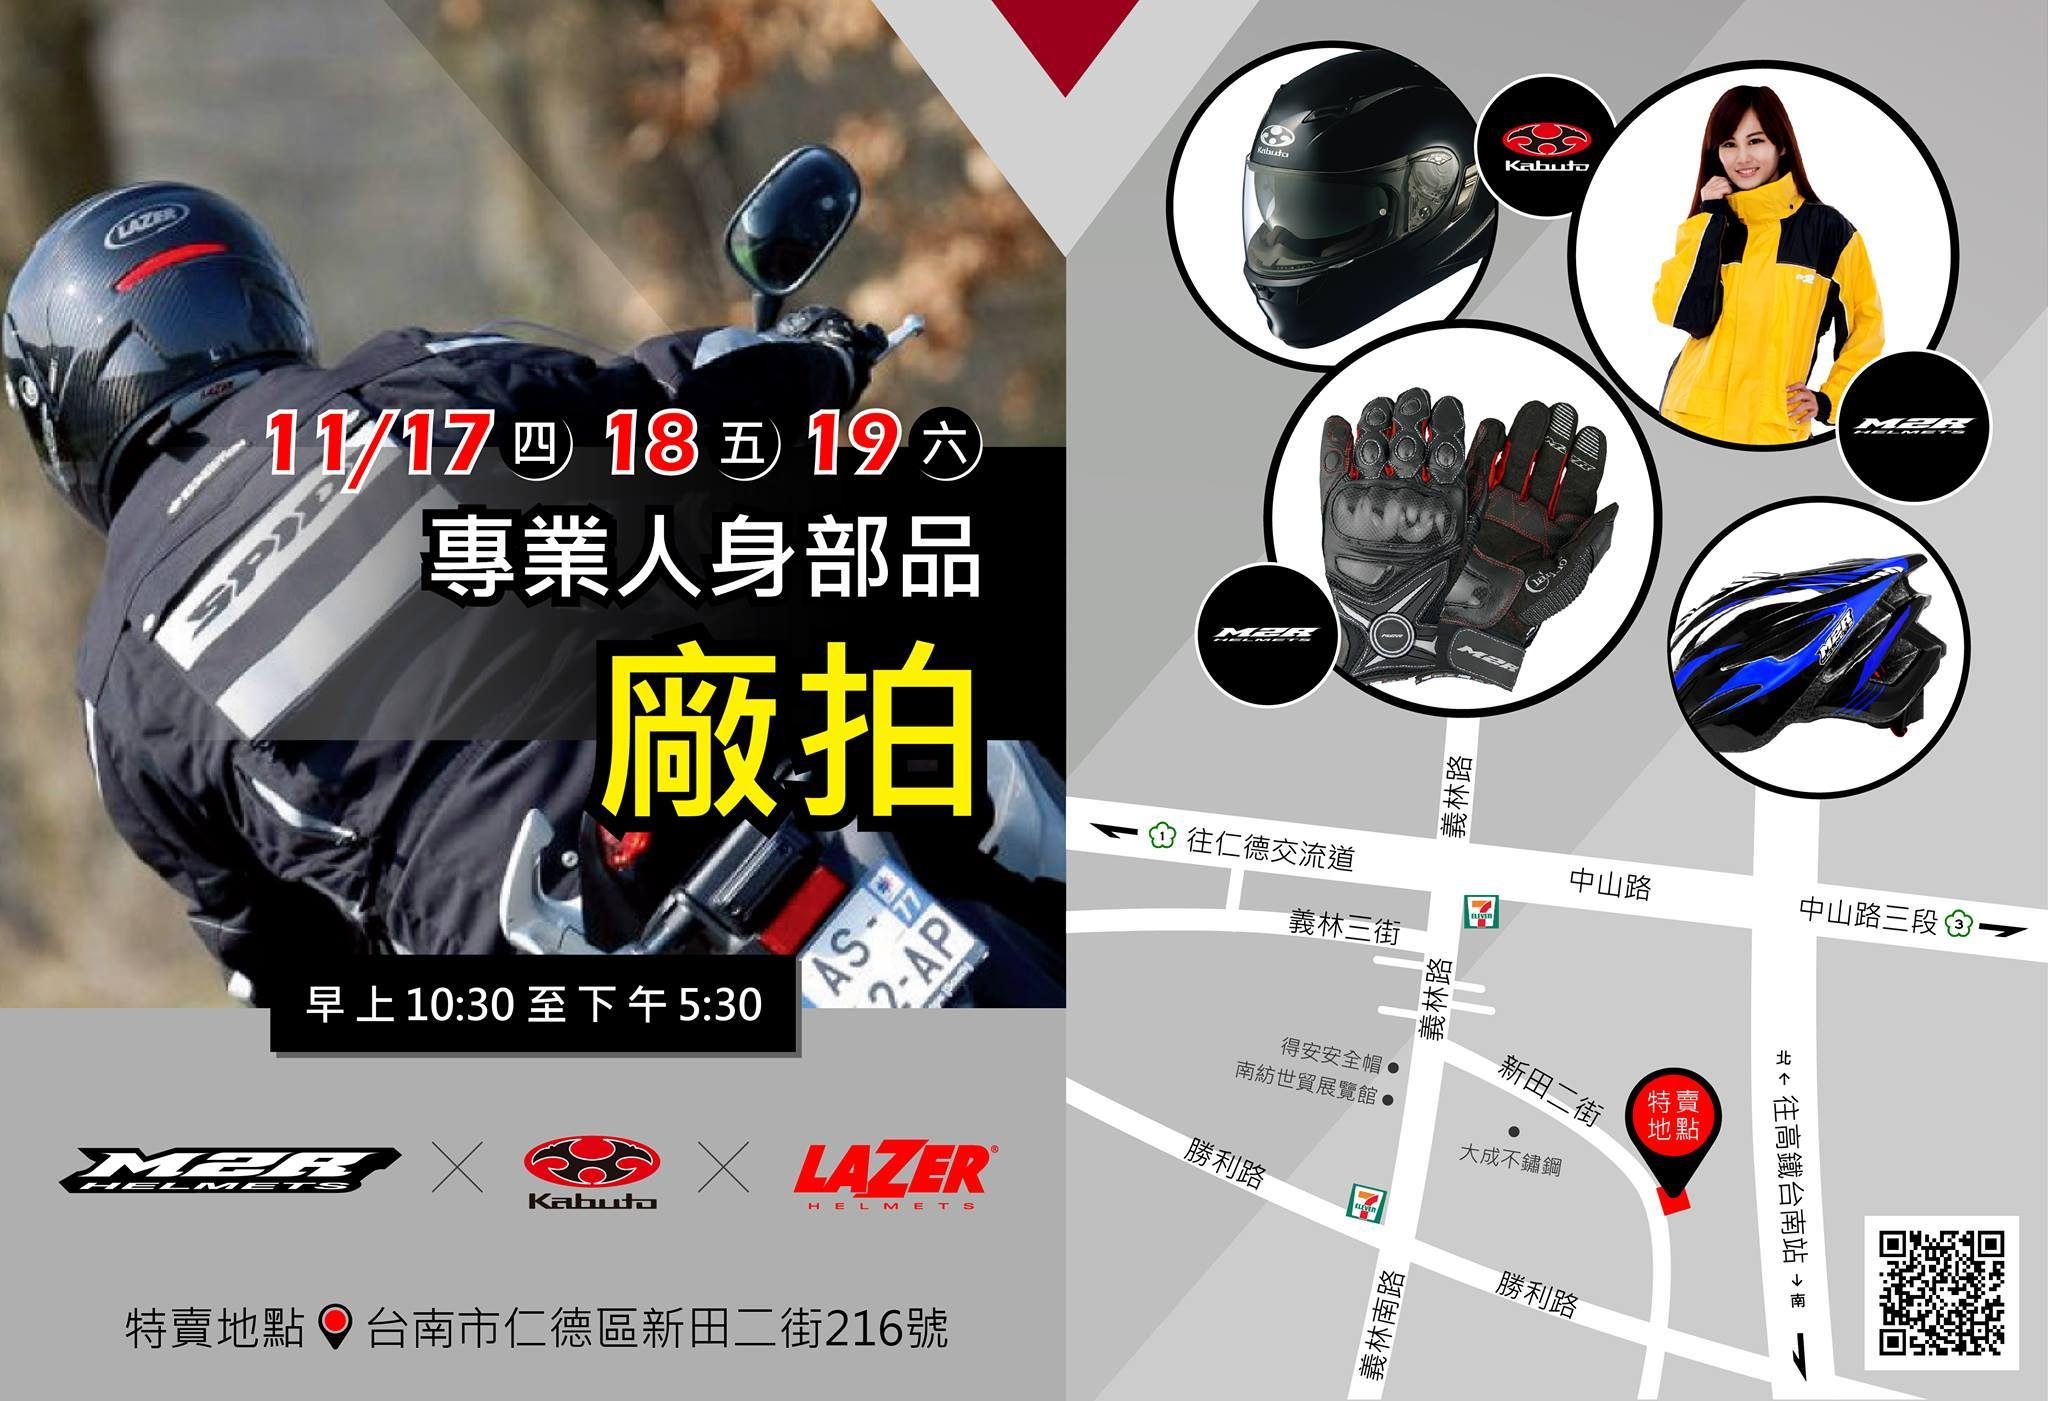 [IN新聞] M2R / OGK /LAZER多款人身部品限時特賣會